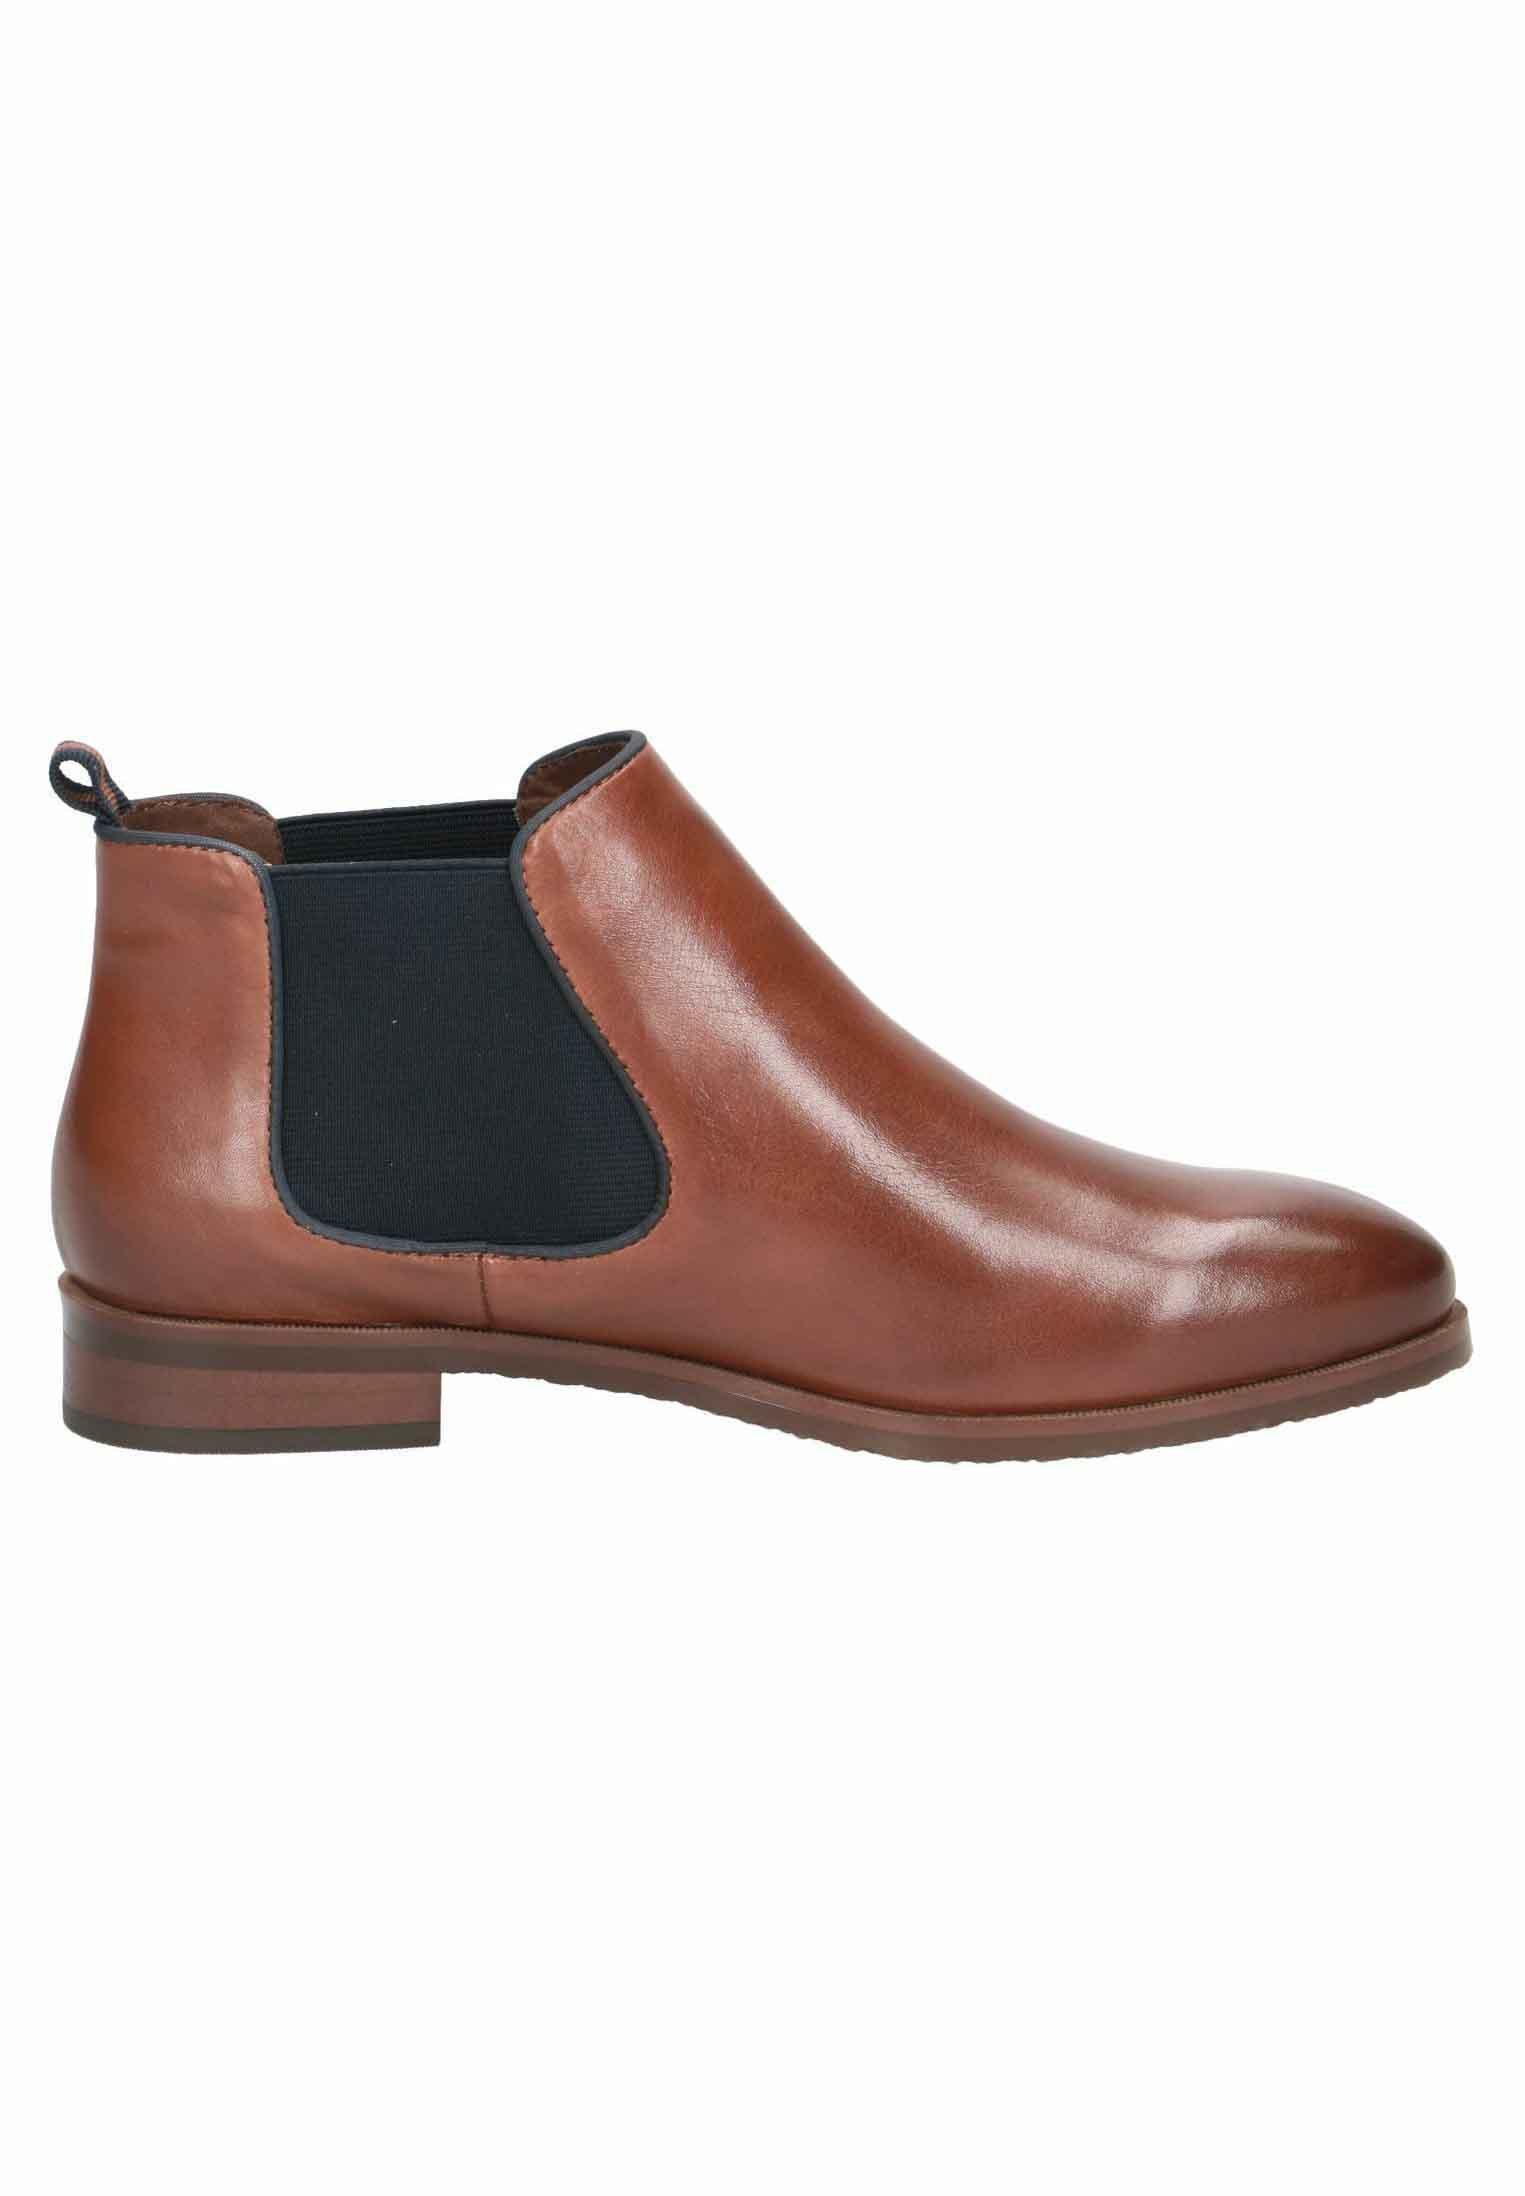 Caprice CHELSEA BOOT Ankle Boot cognac/ocean/braun